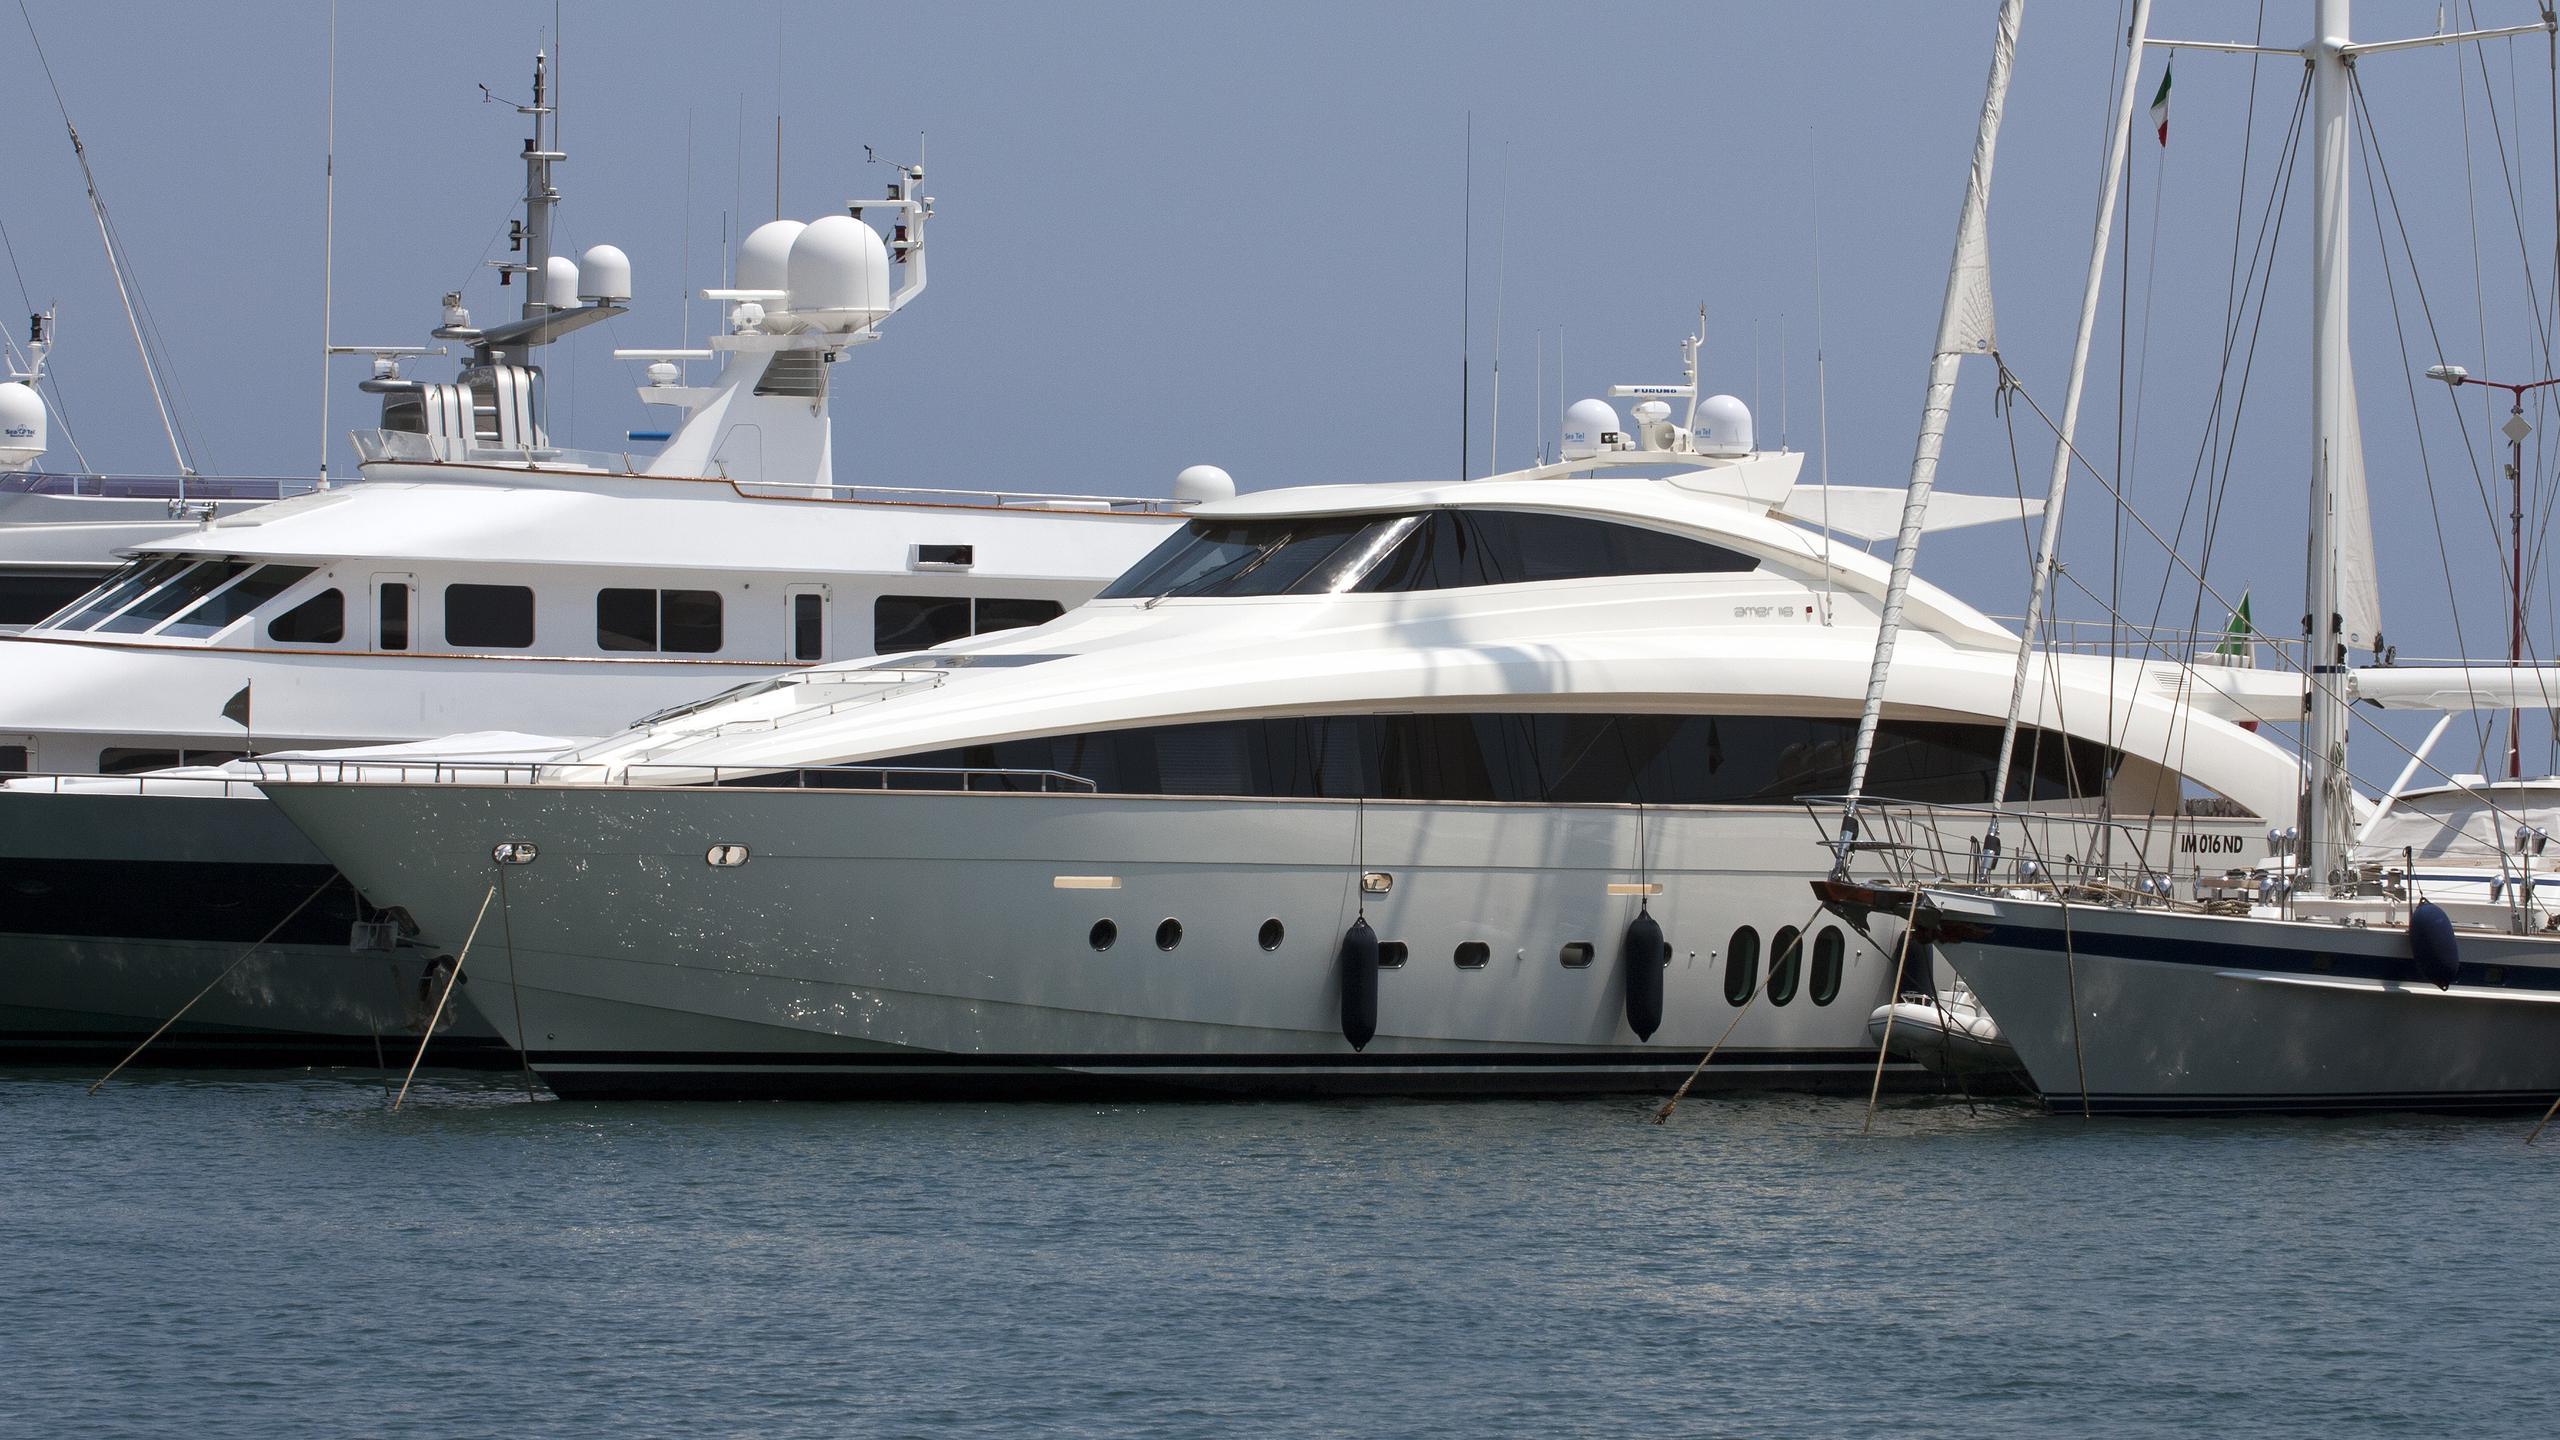 imagin-motor-yacht-permare-2009-36m-half-profile